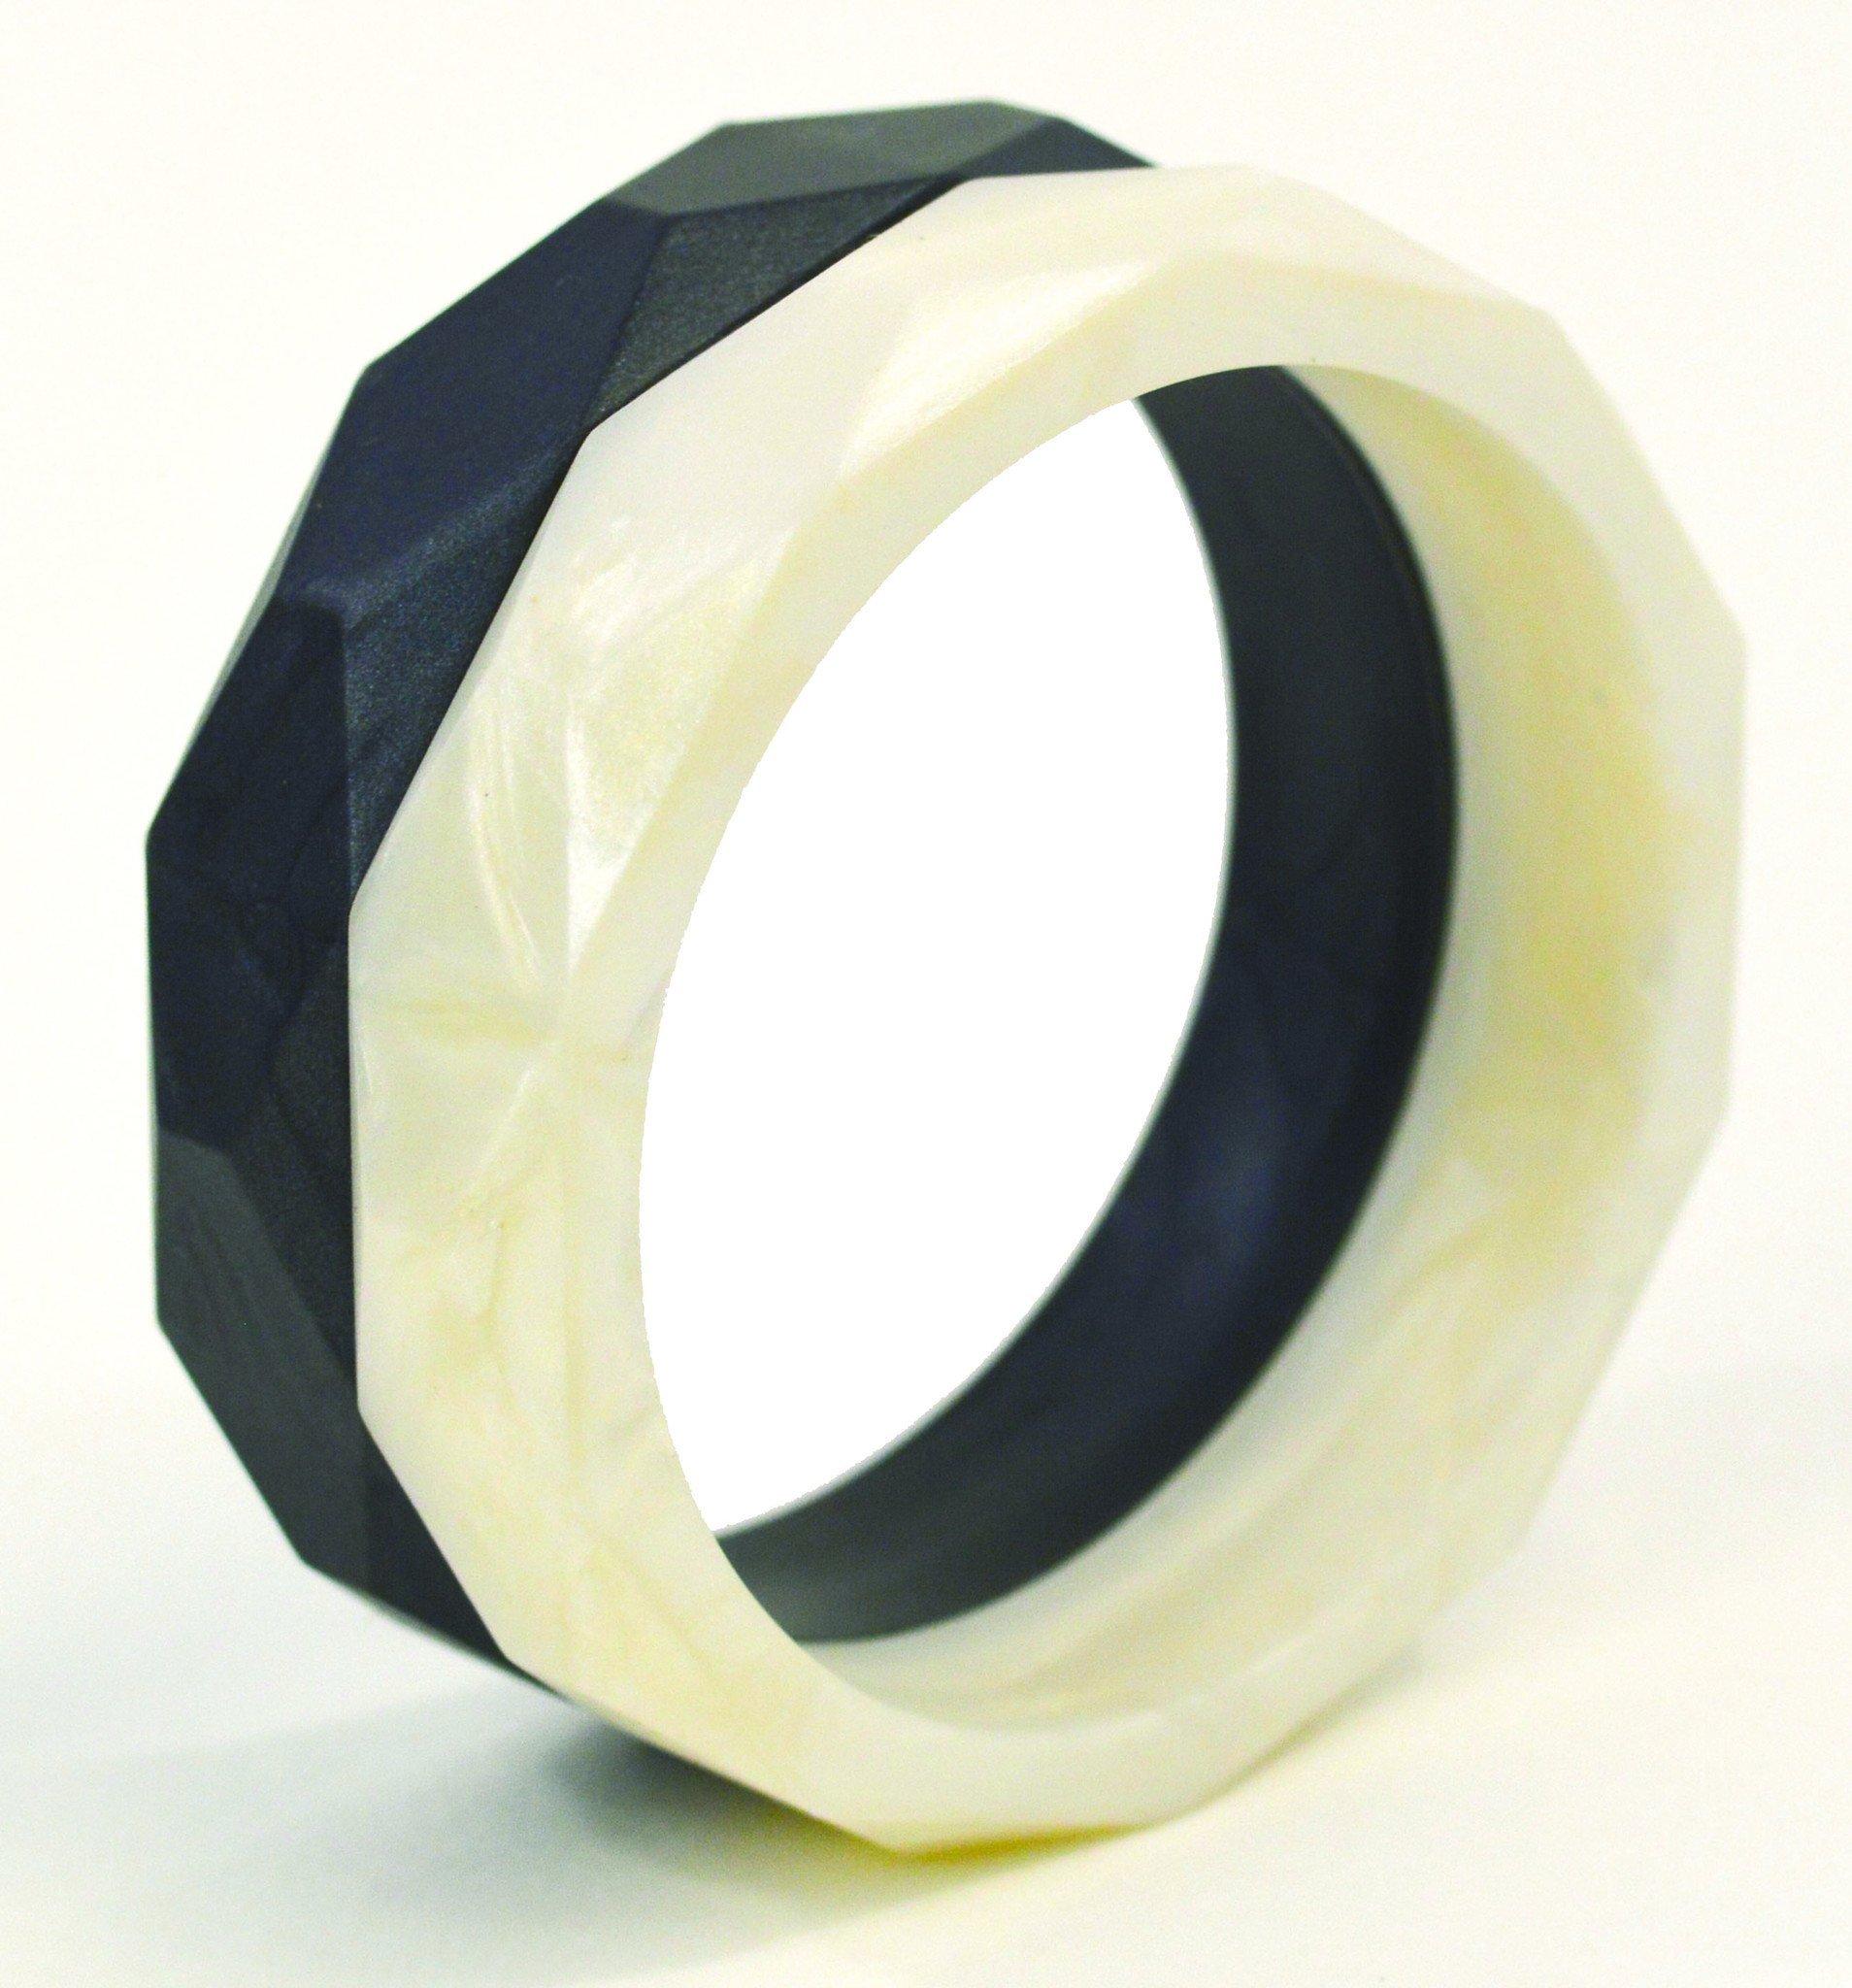 Gumeez 'Grace' Teething Bangle Set (White Pearl & Black Pearl)